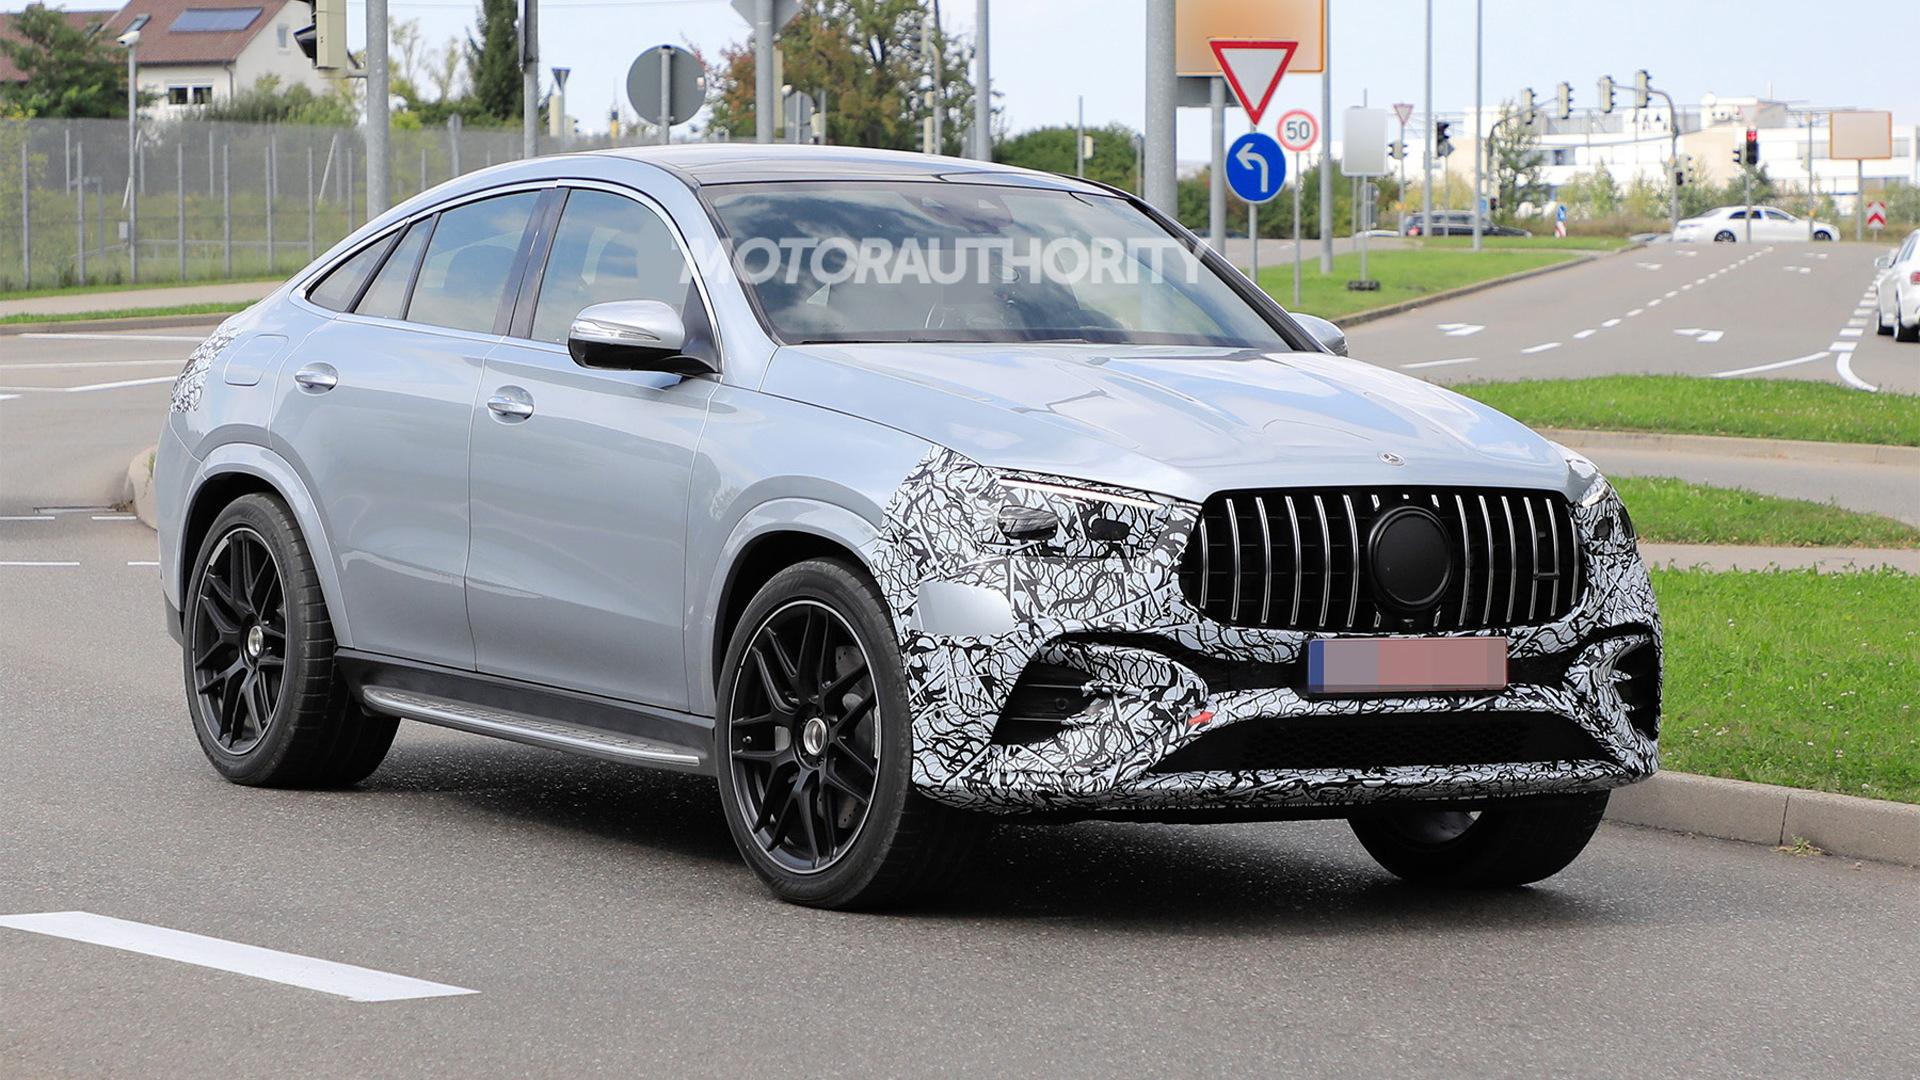 2023 Mercedes-Benz AMG GLE53 Coupe facelift spy shots - Photo credit: S. Baldauf/SB-Medien